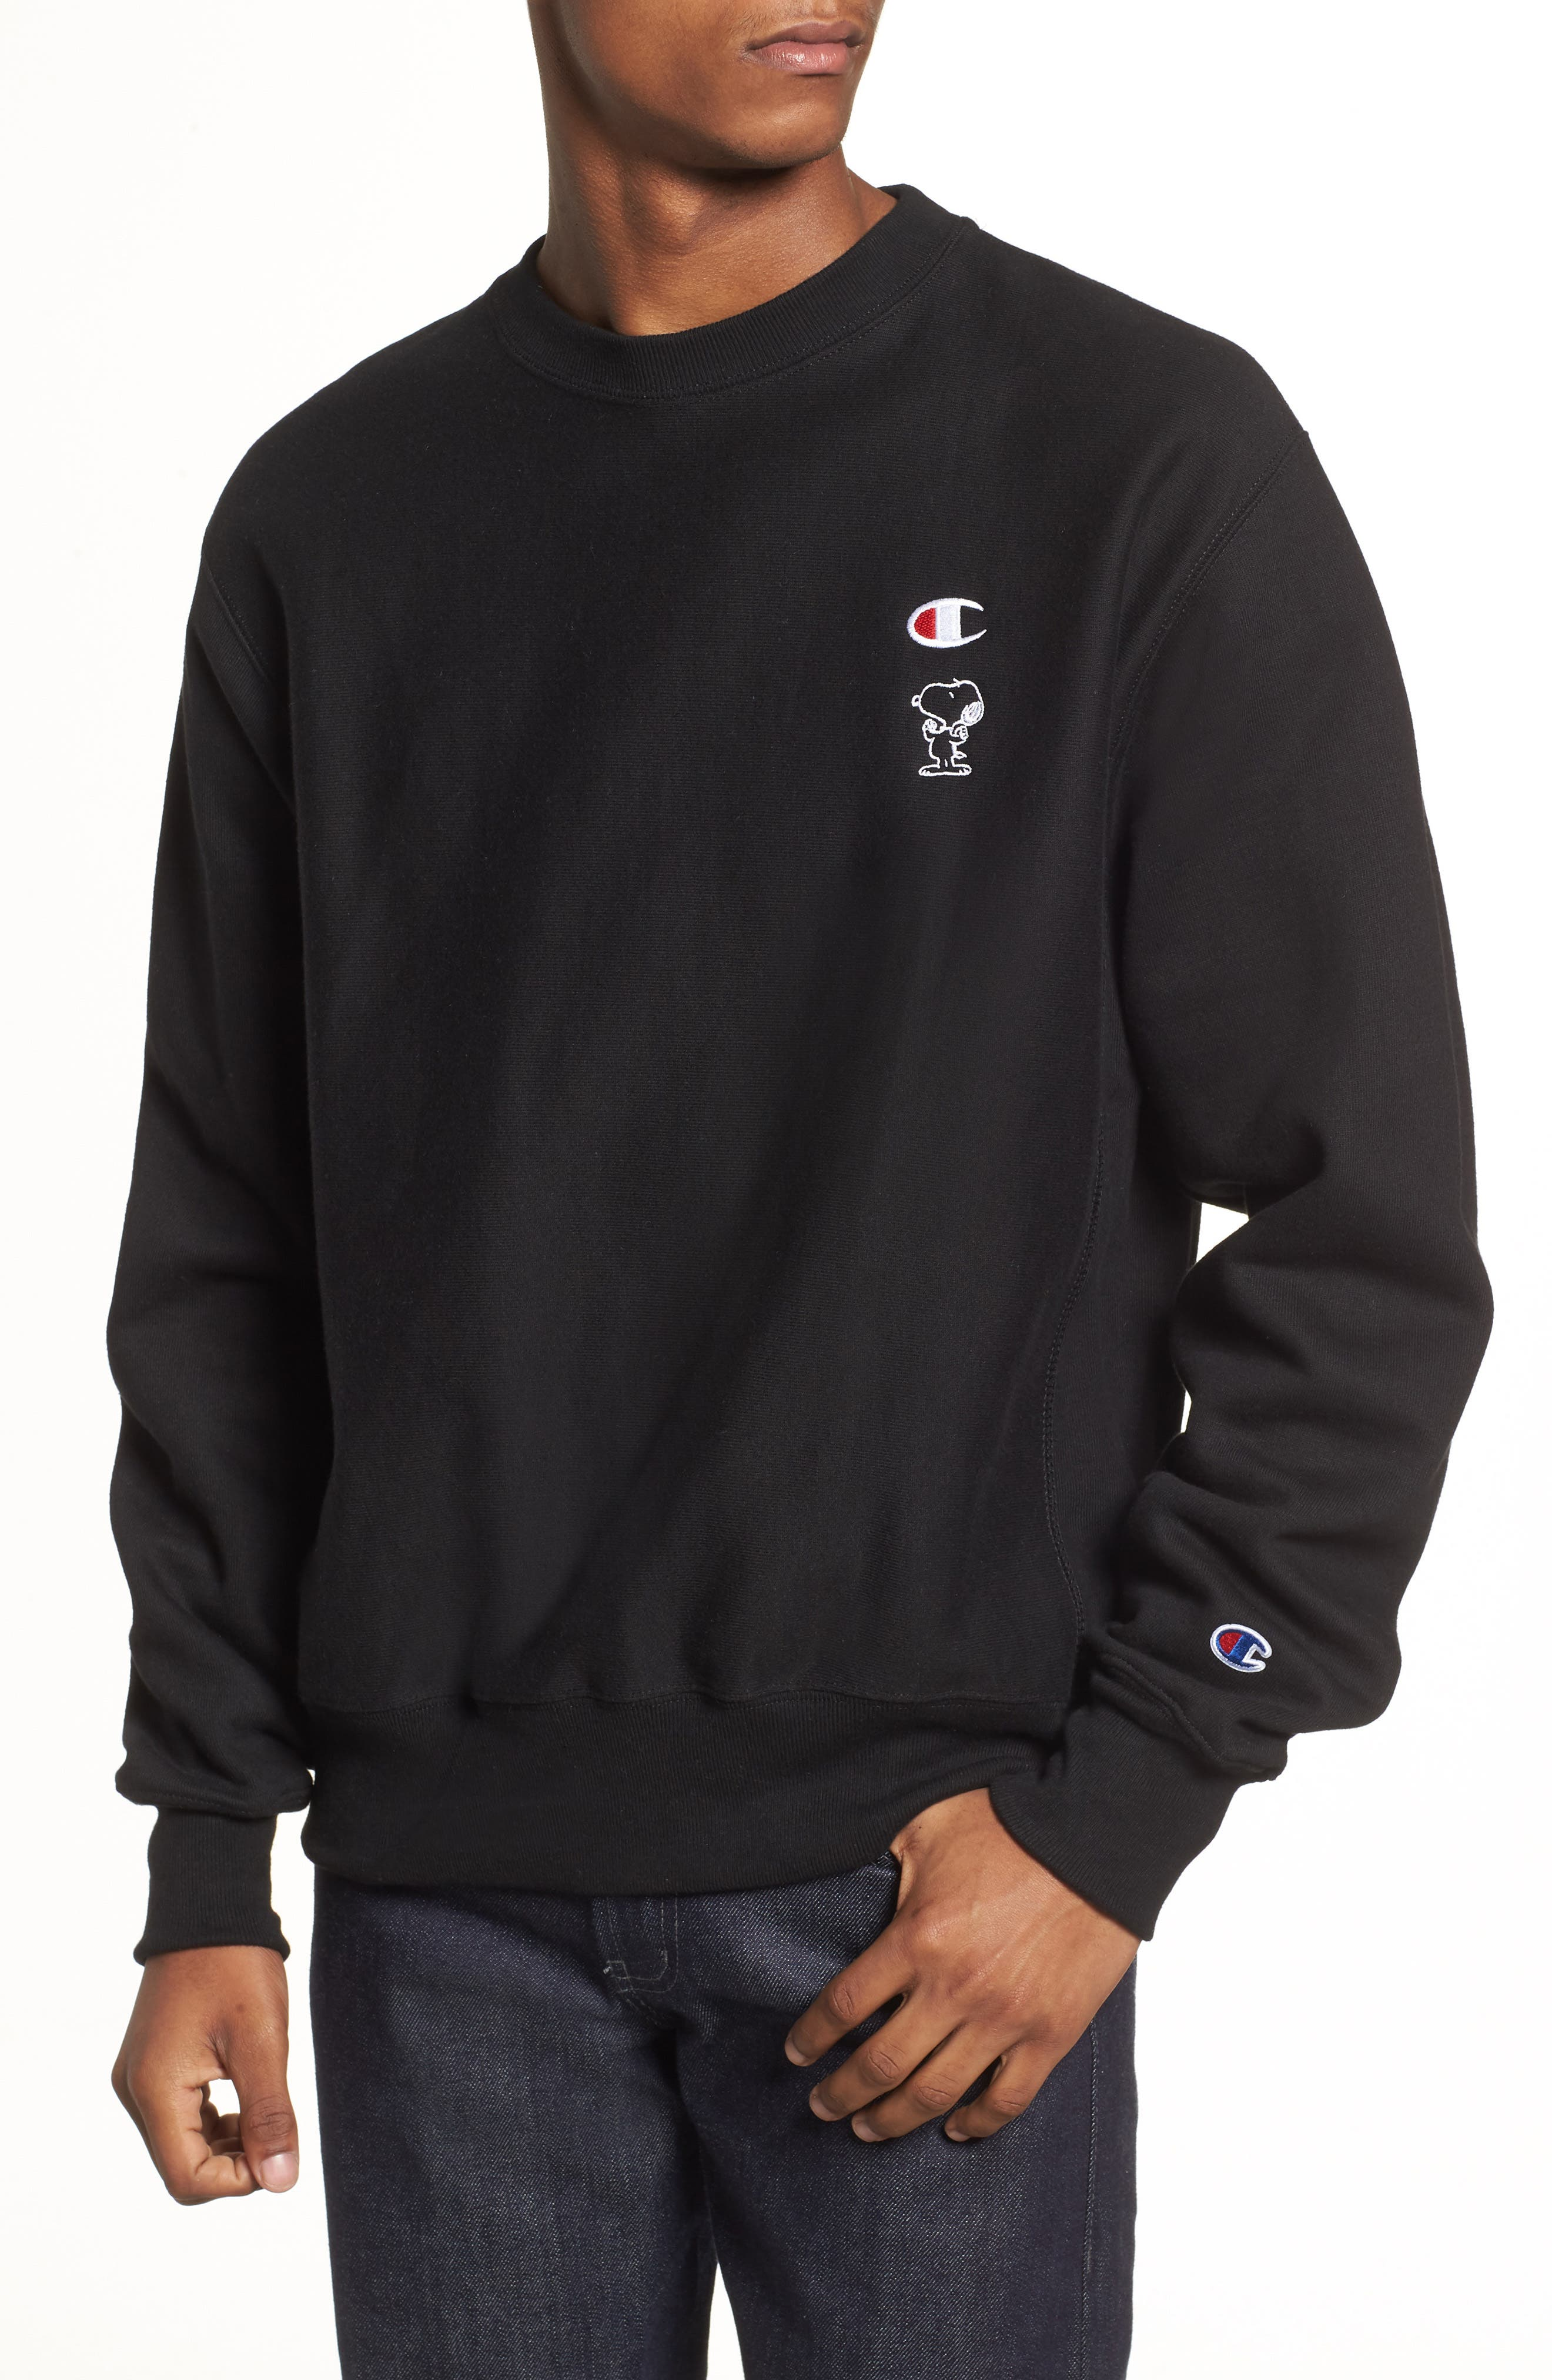 Snoopy Unisex Sweatshirt,                         Main,                         color, 001